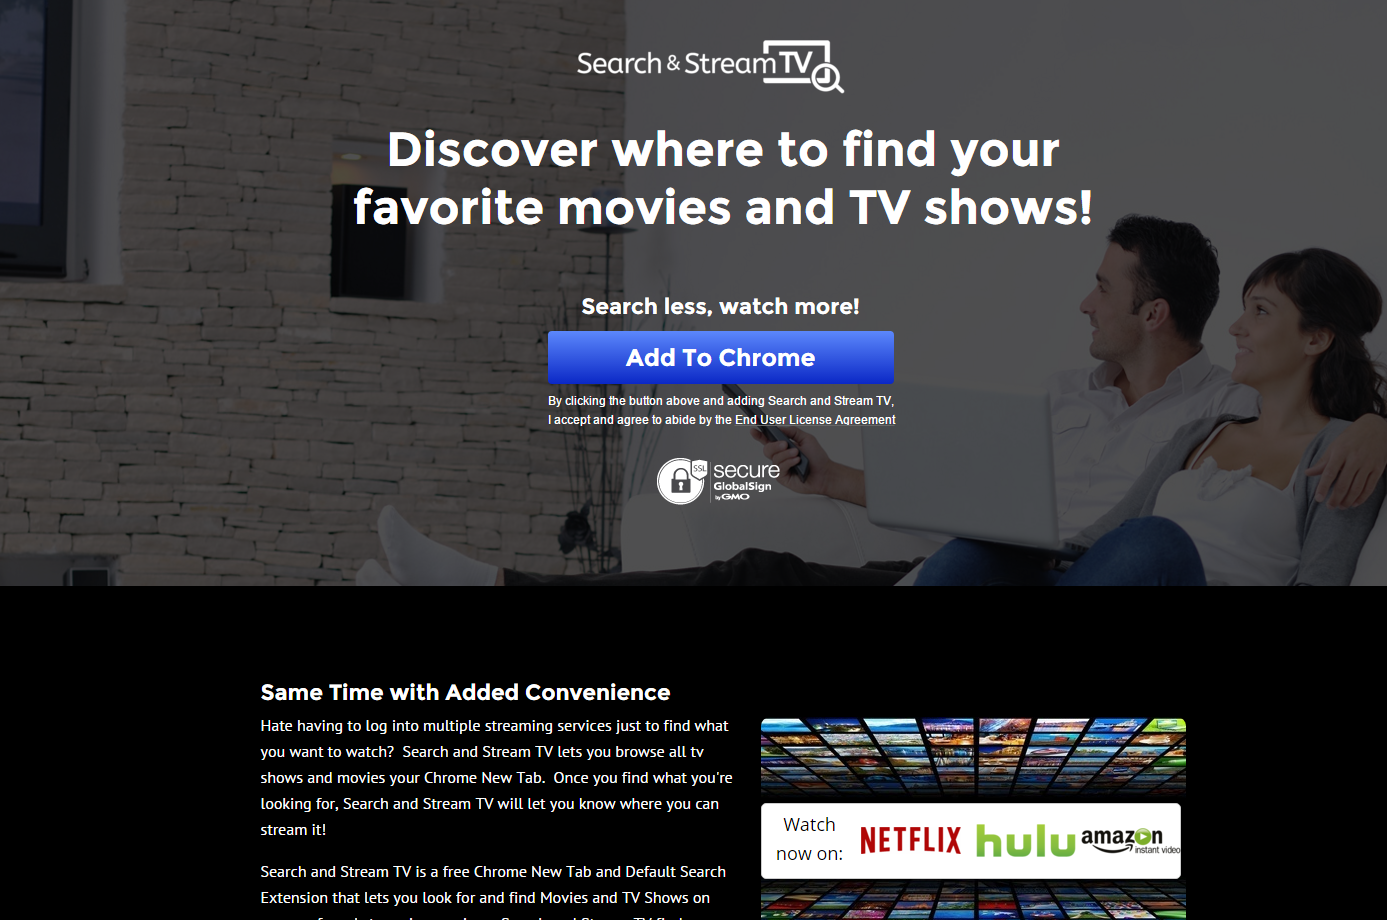 Searchandstreamtv.com Ads